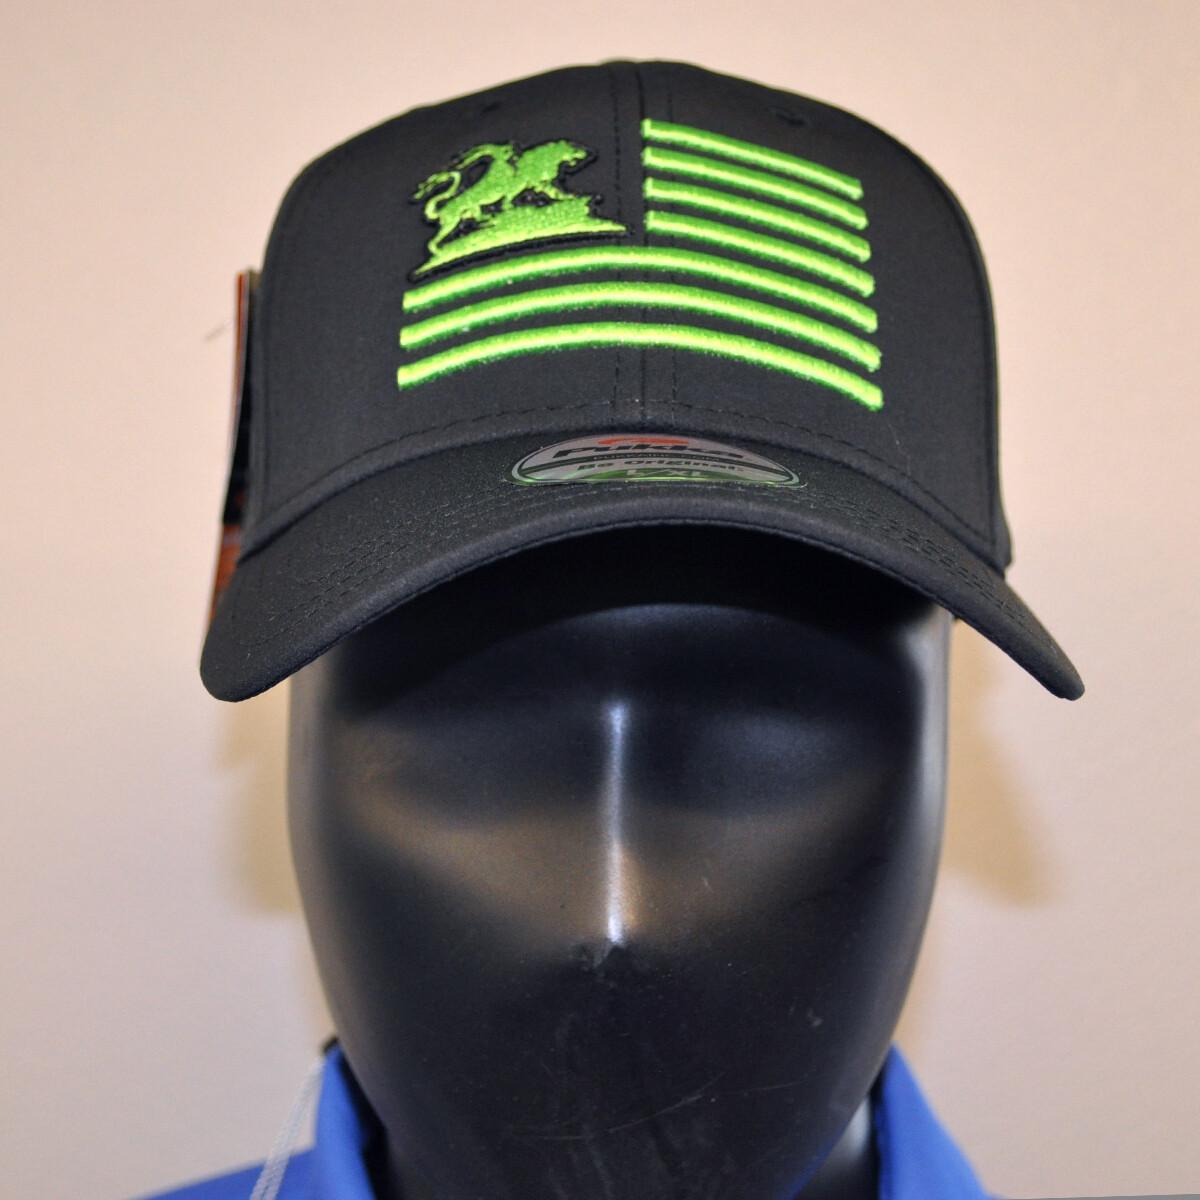 Men's Golf Hat - Black/Green